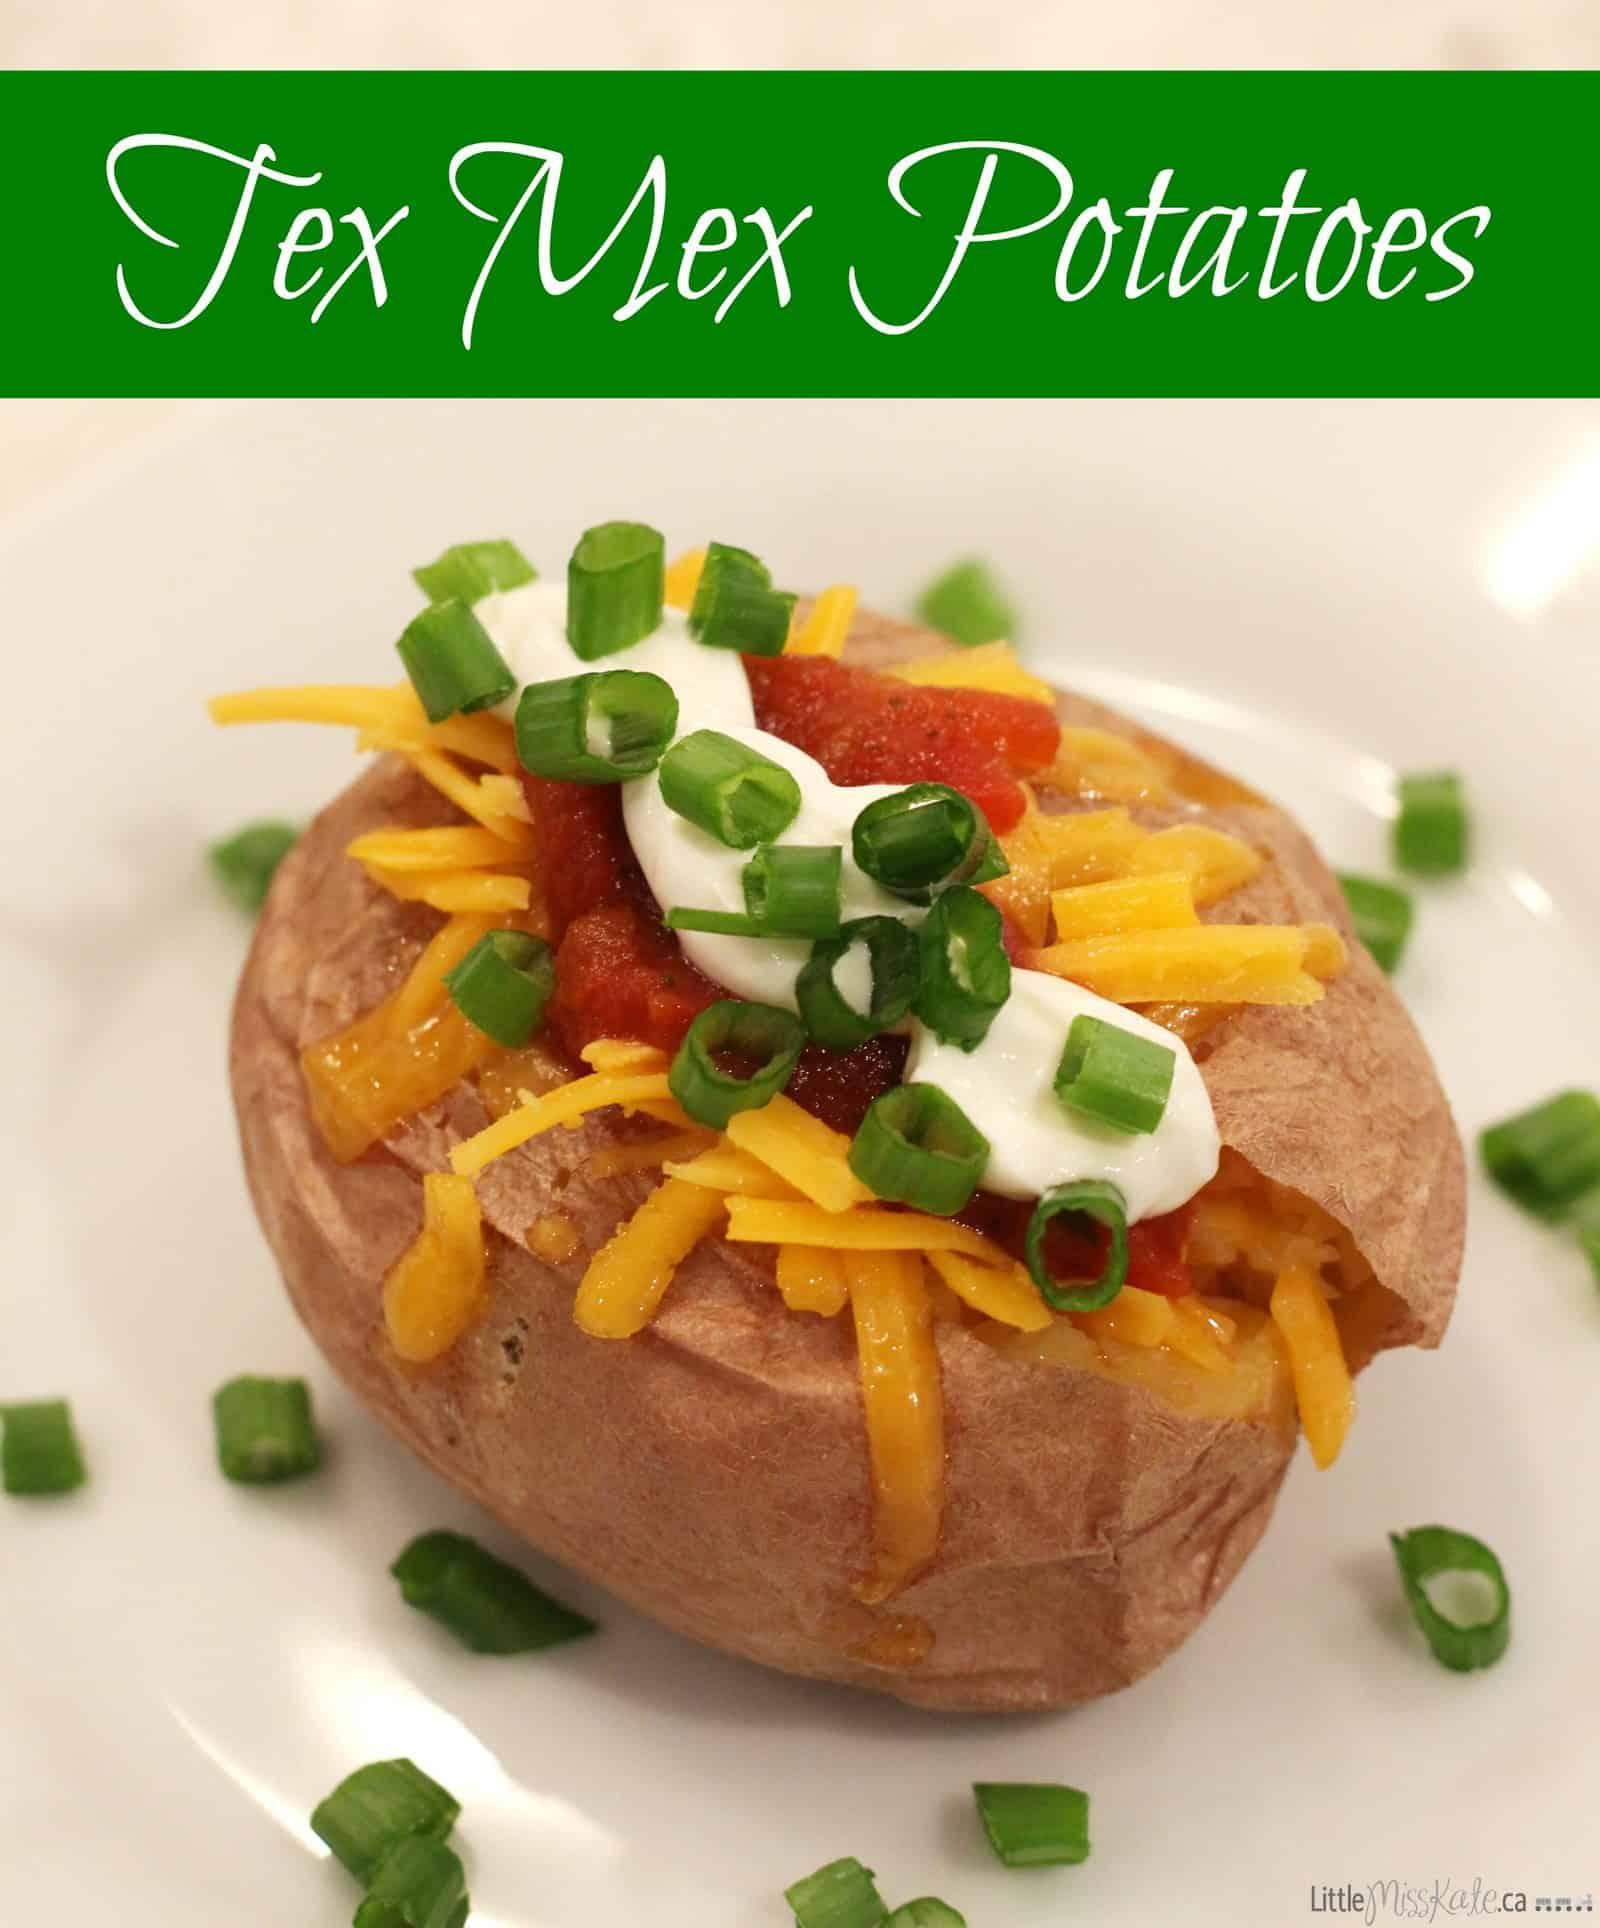 Easy tex mex baked potatoes recipe - Quick side dish idea